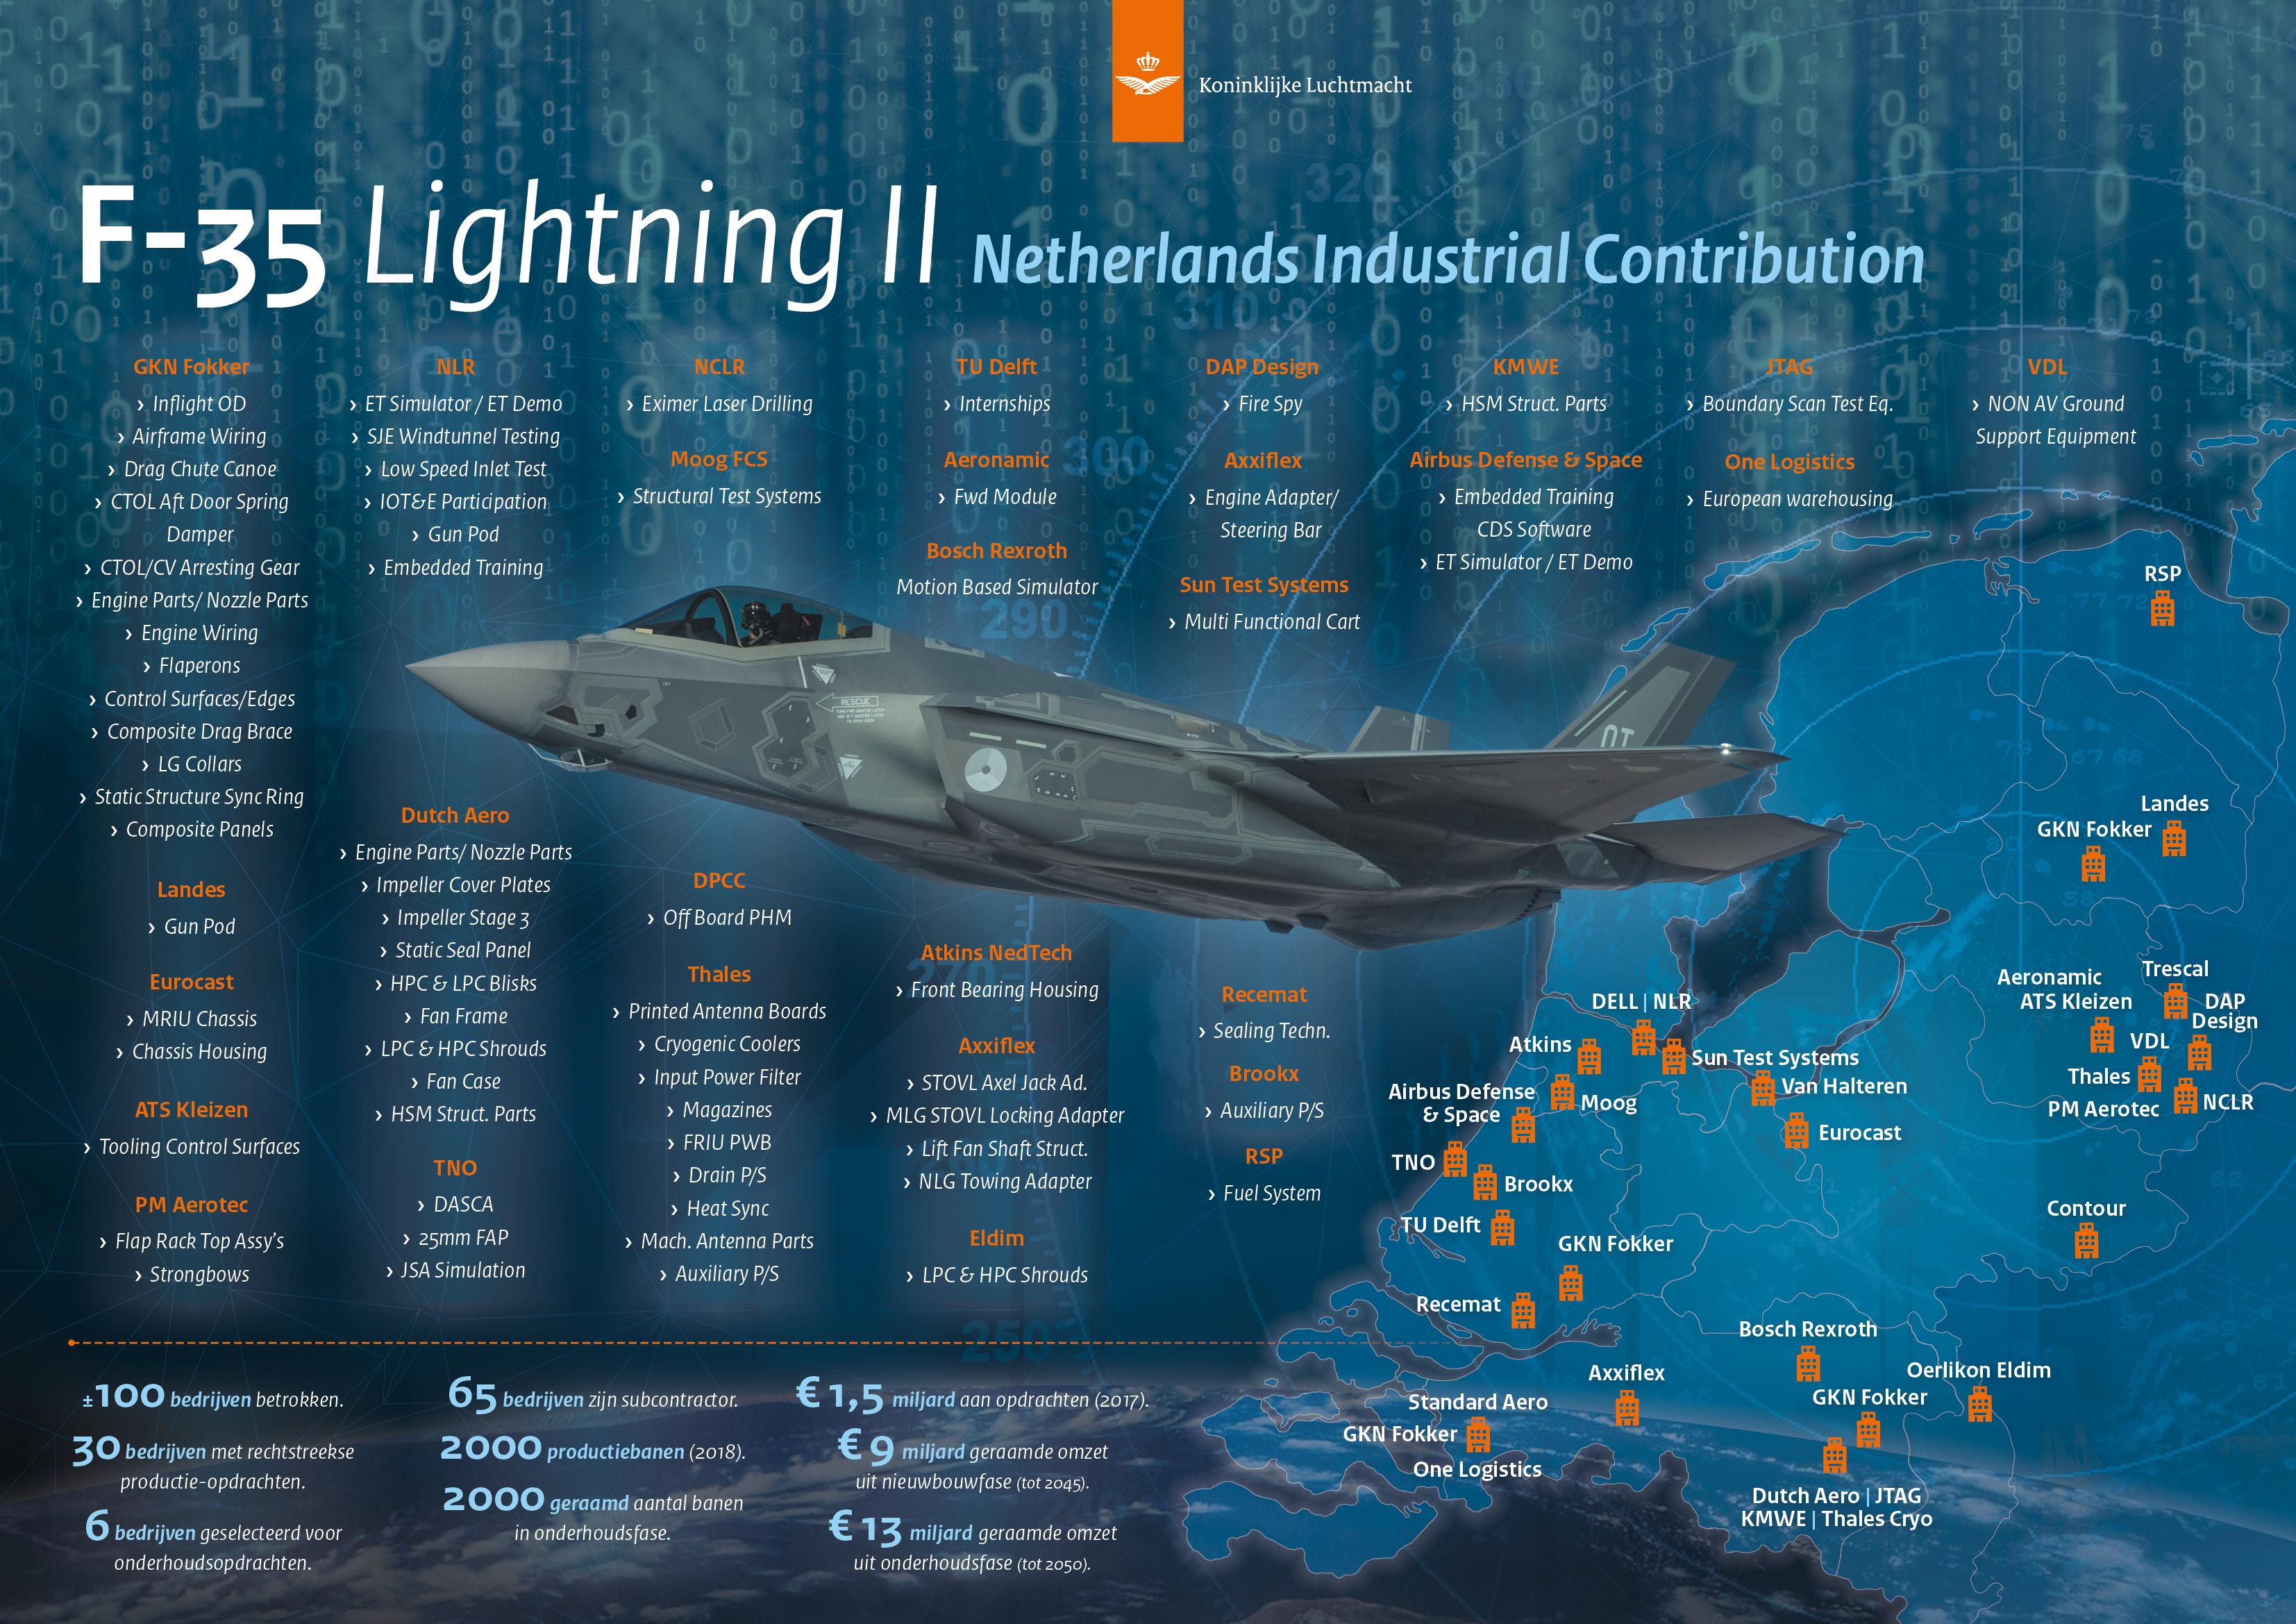 KLu infographic F-35 Lightning II, industriële samenwerking